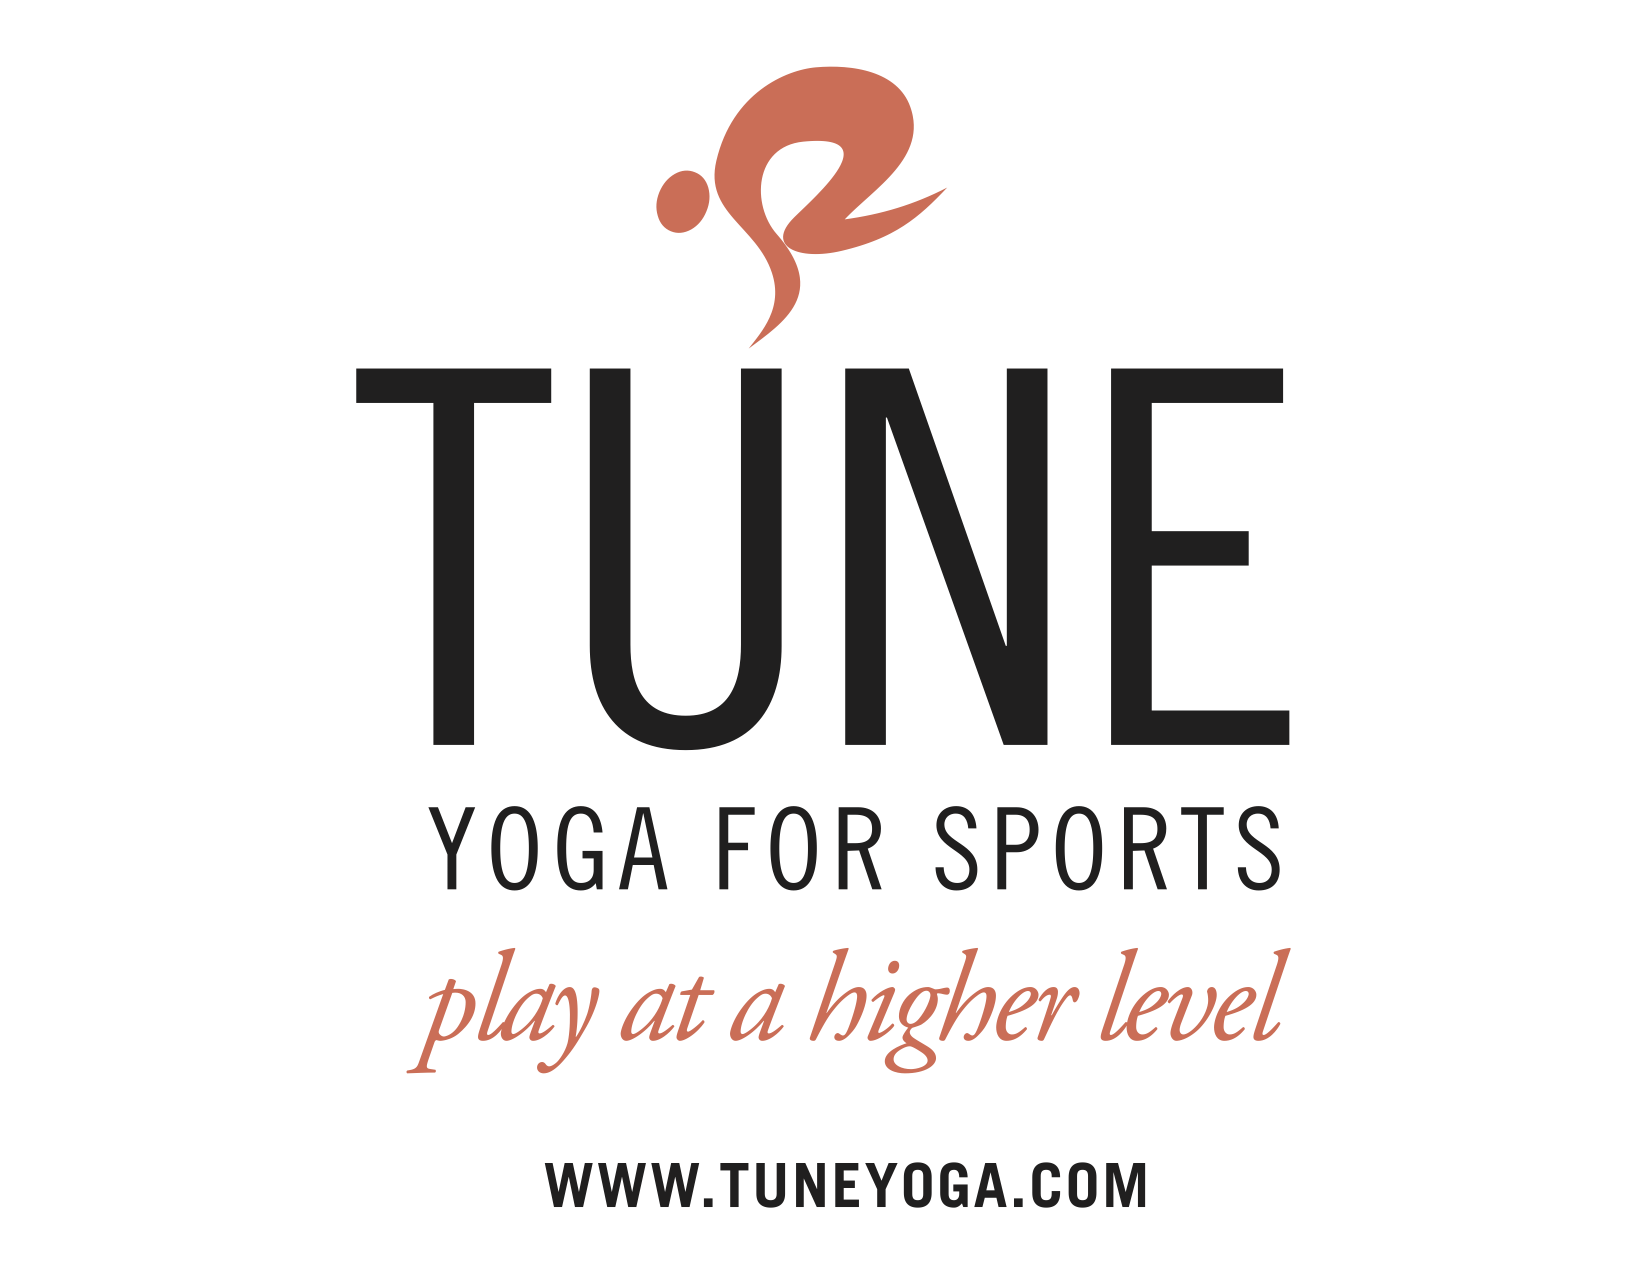 Tune Yoga